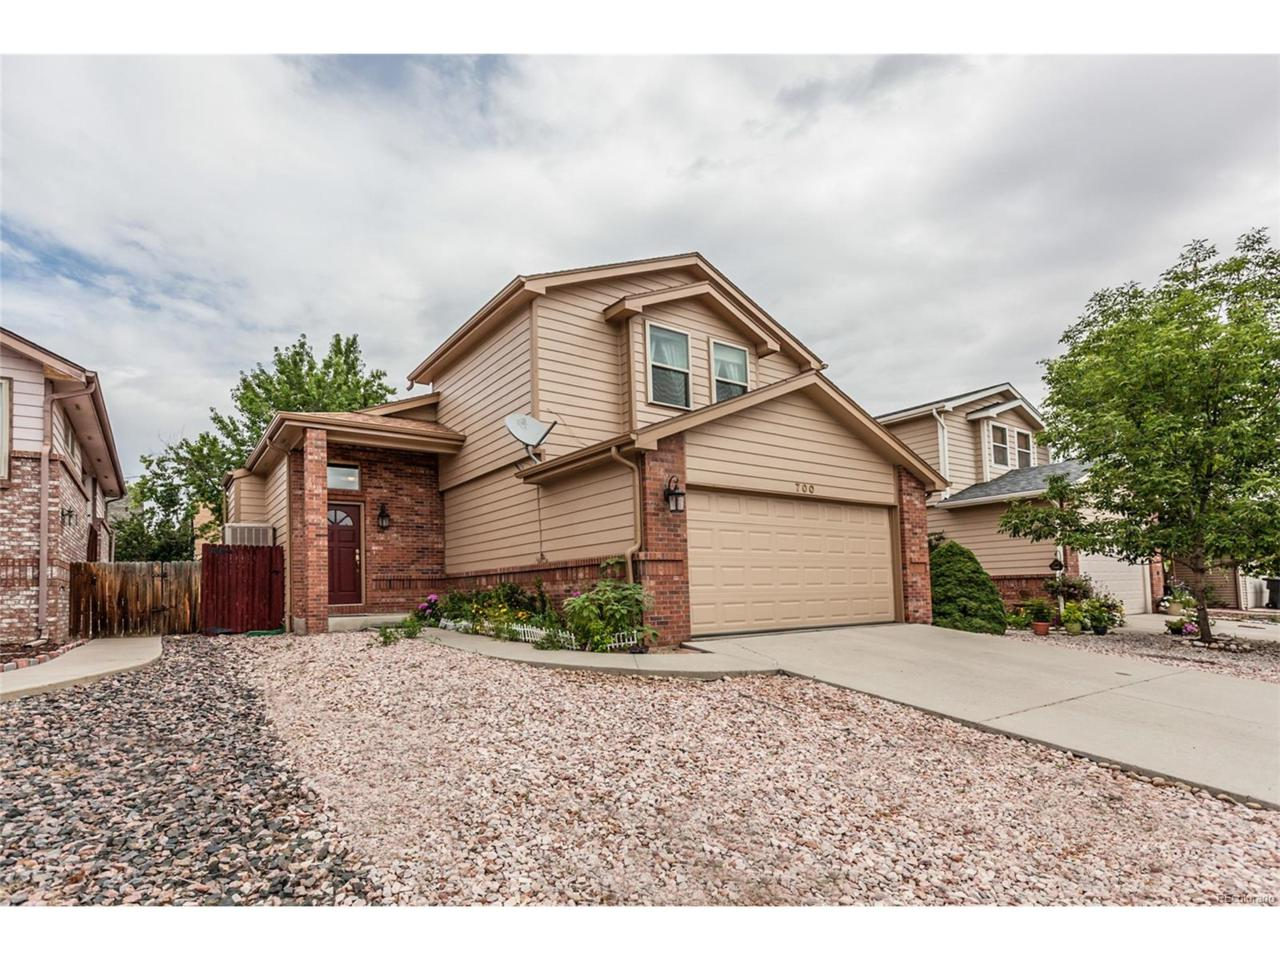 700 Wade Road, Longmont, CO 80503 (MLS #8438625) :: 8z Real Estate